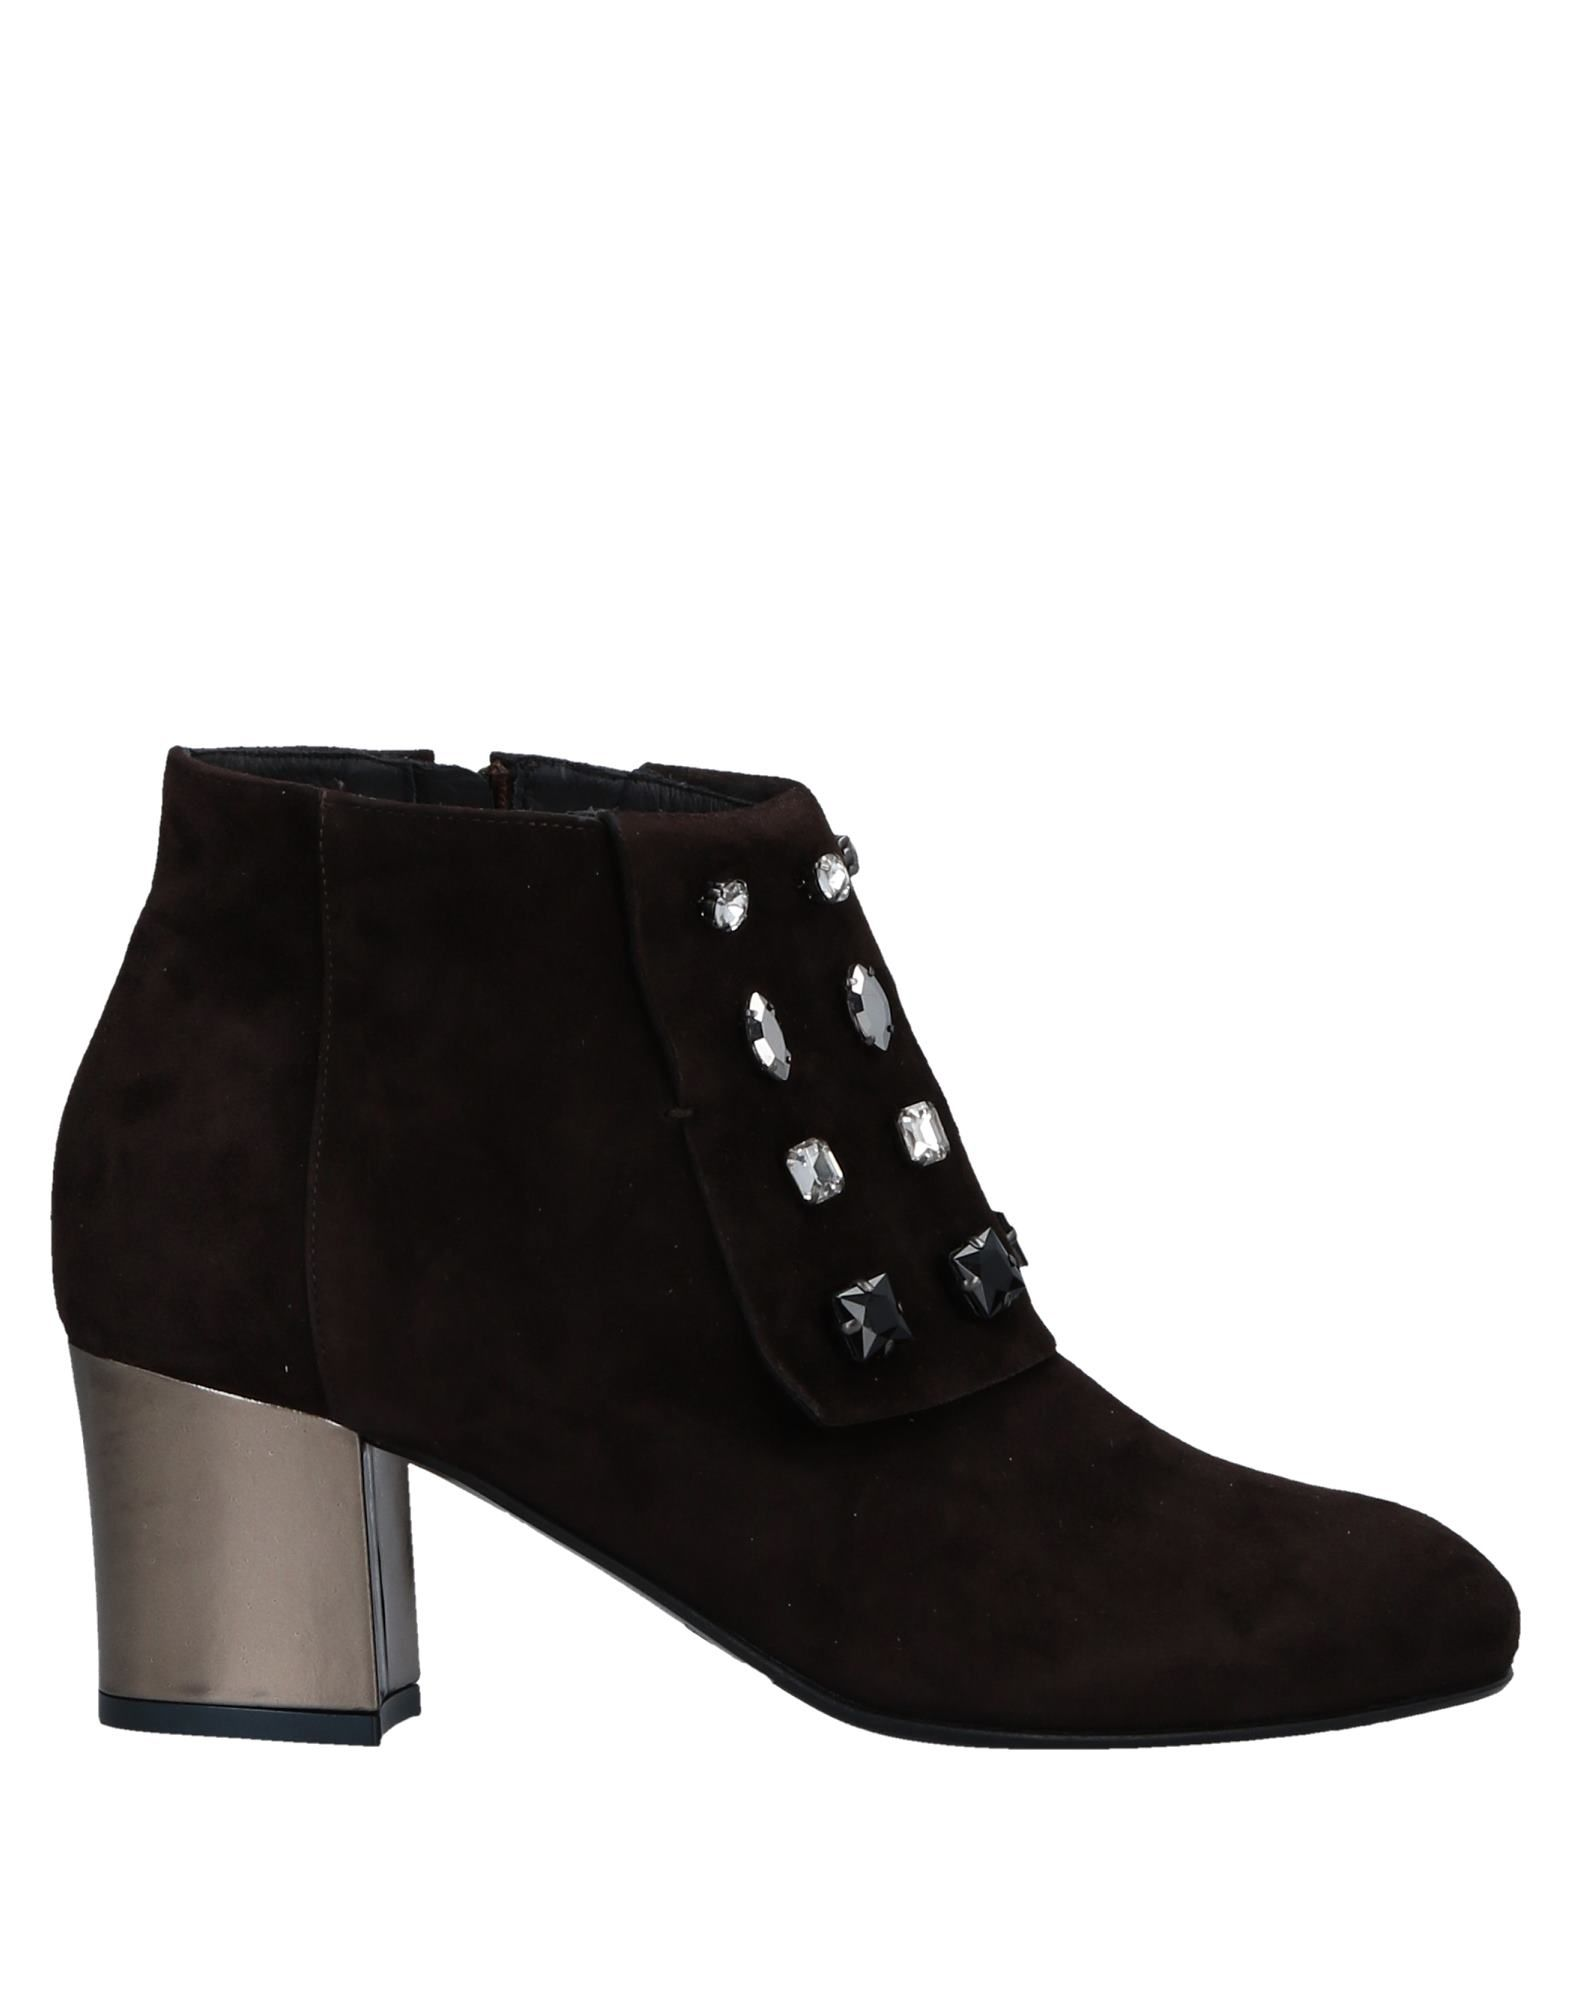 Rabatt Schuhe Alberto Gozzi Stiefelette Damen  11522059PV